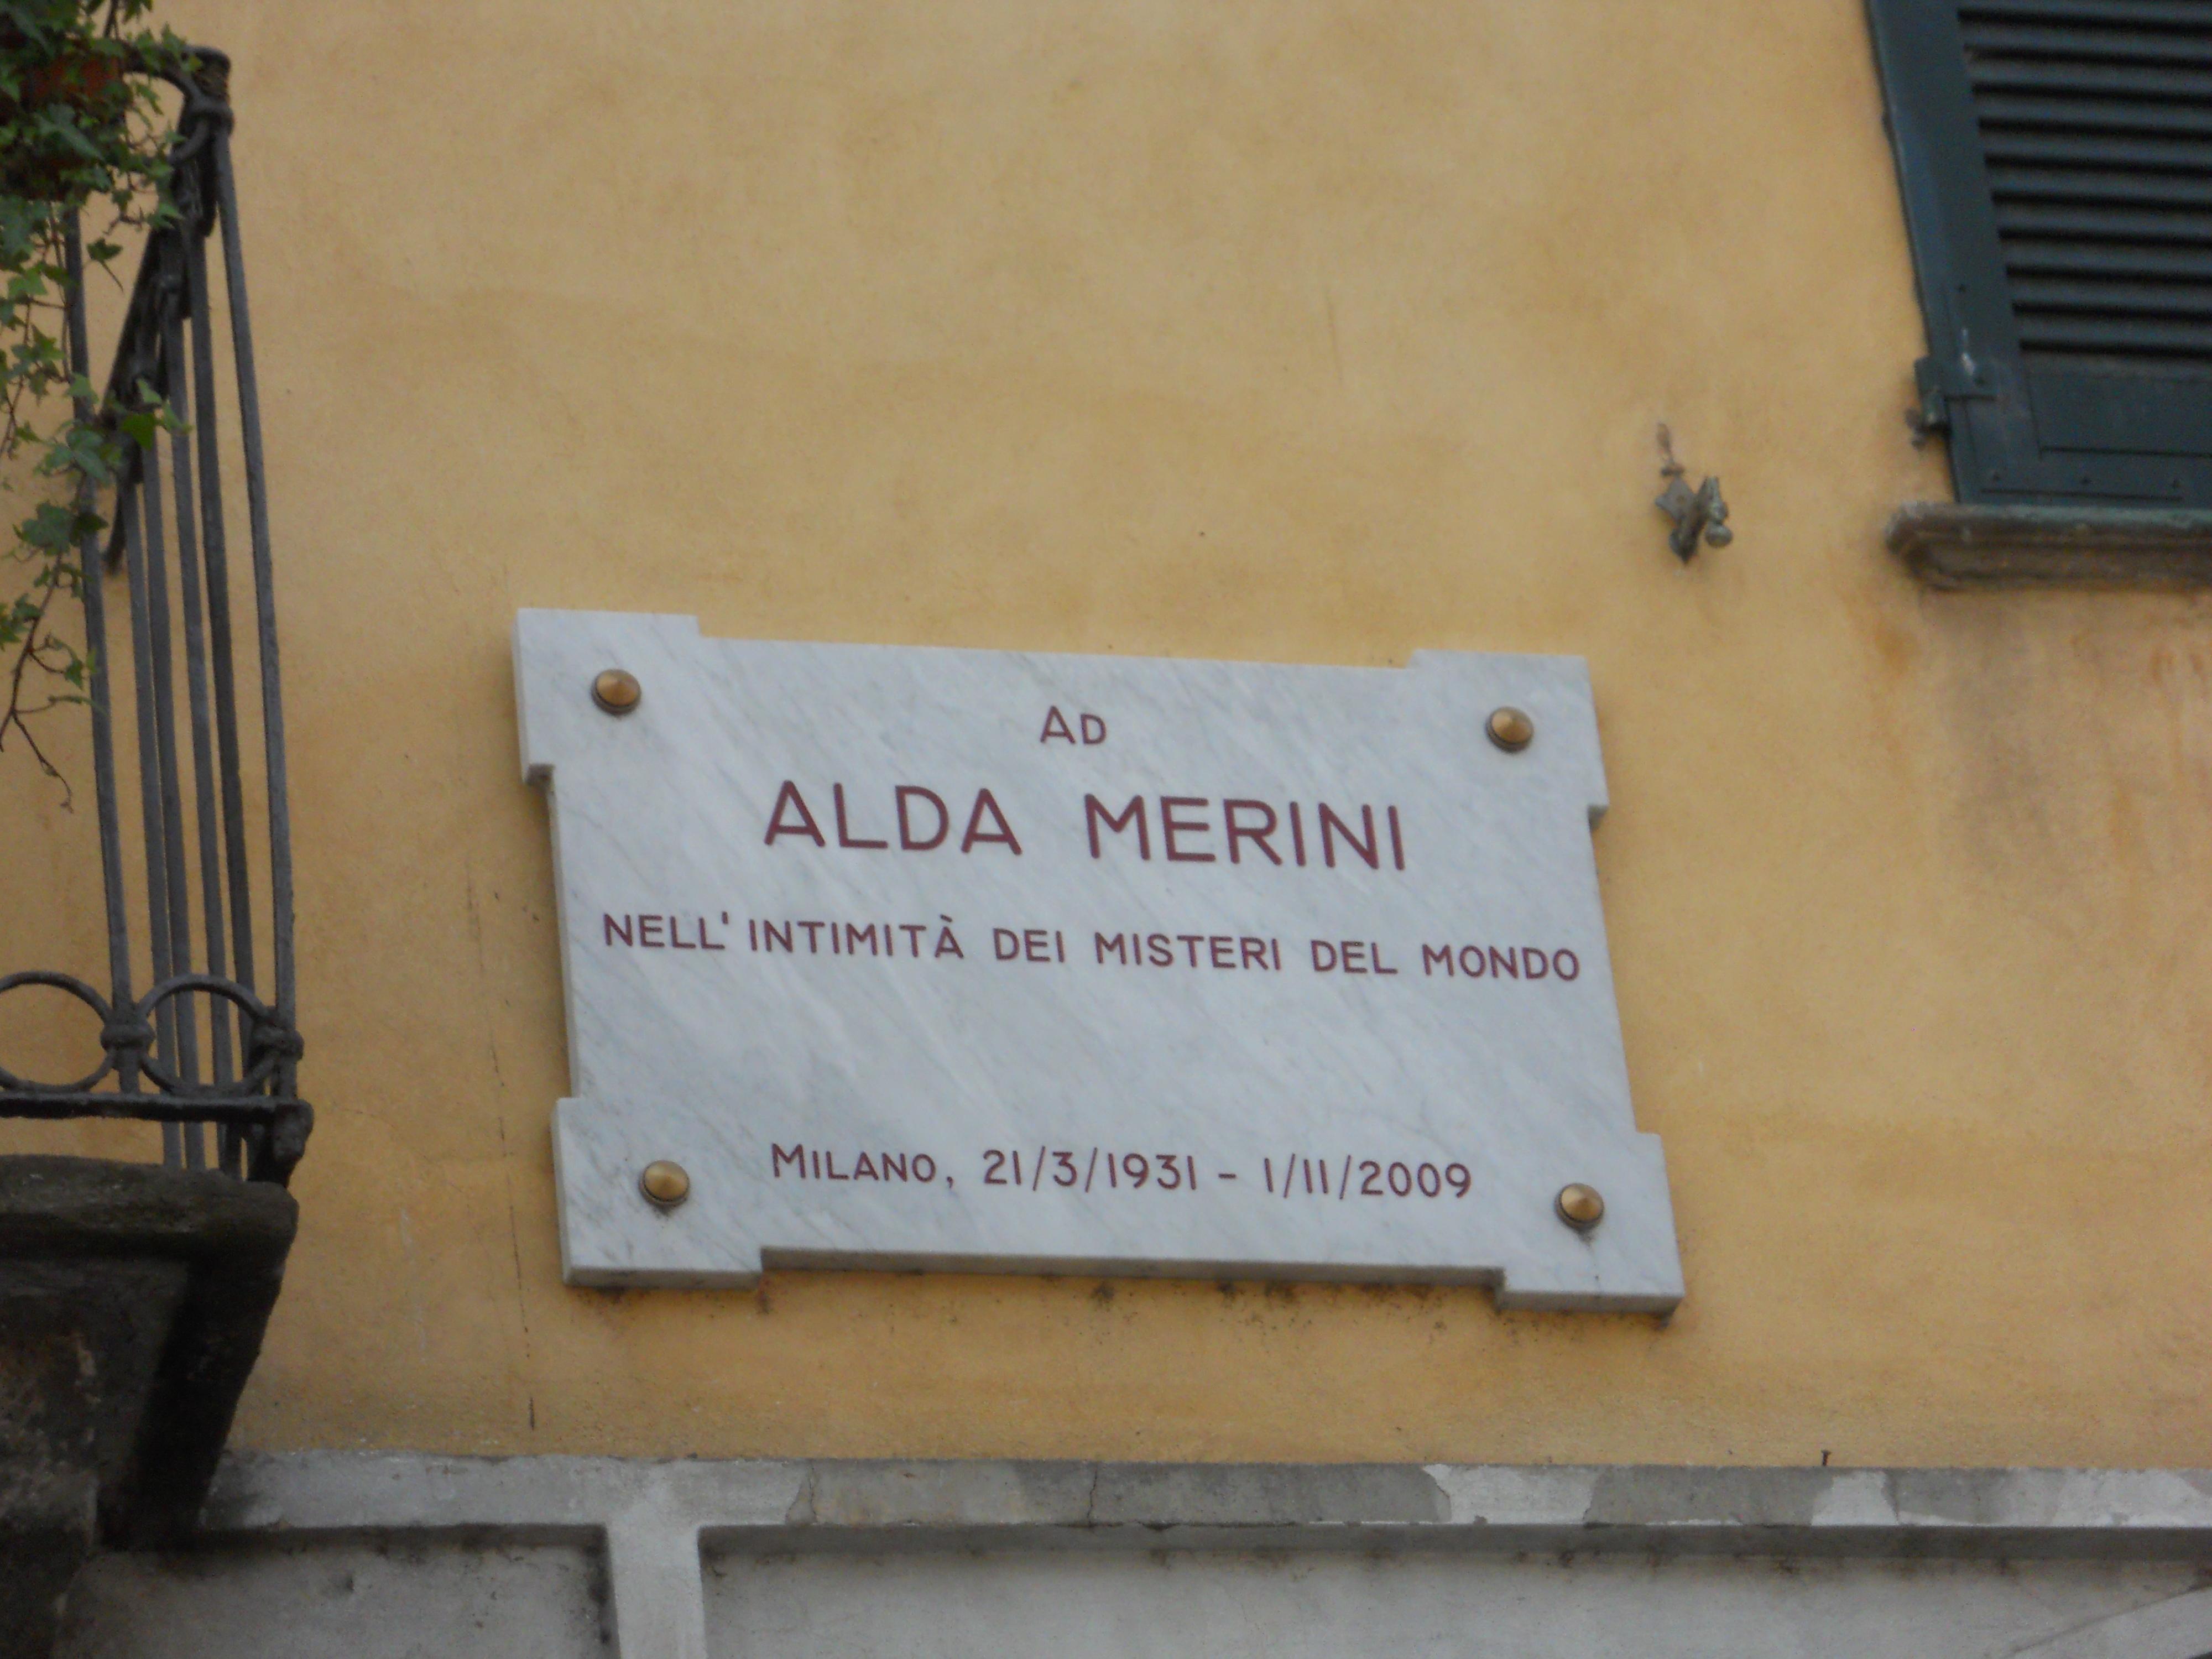 Alda Merini Wikipedia